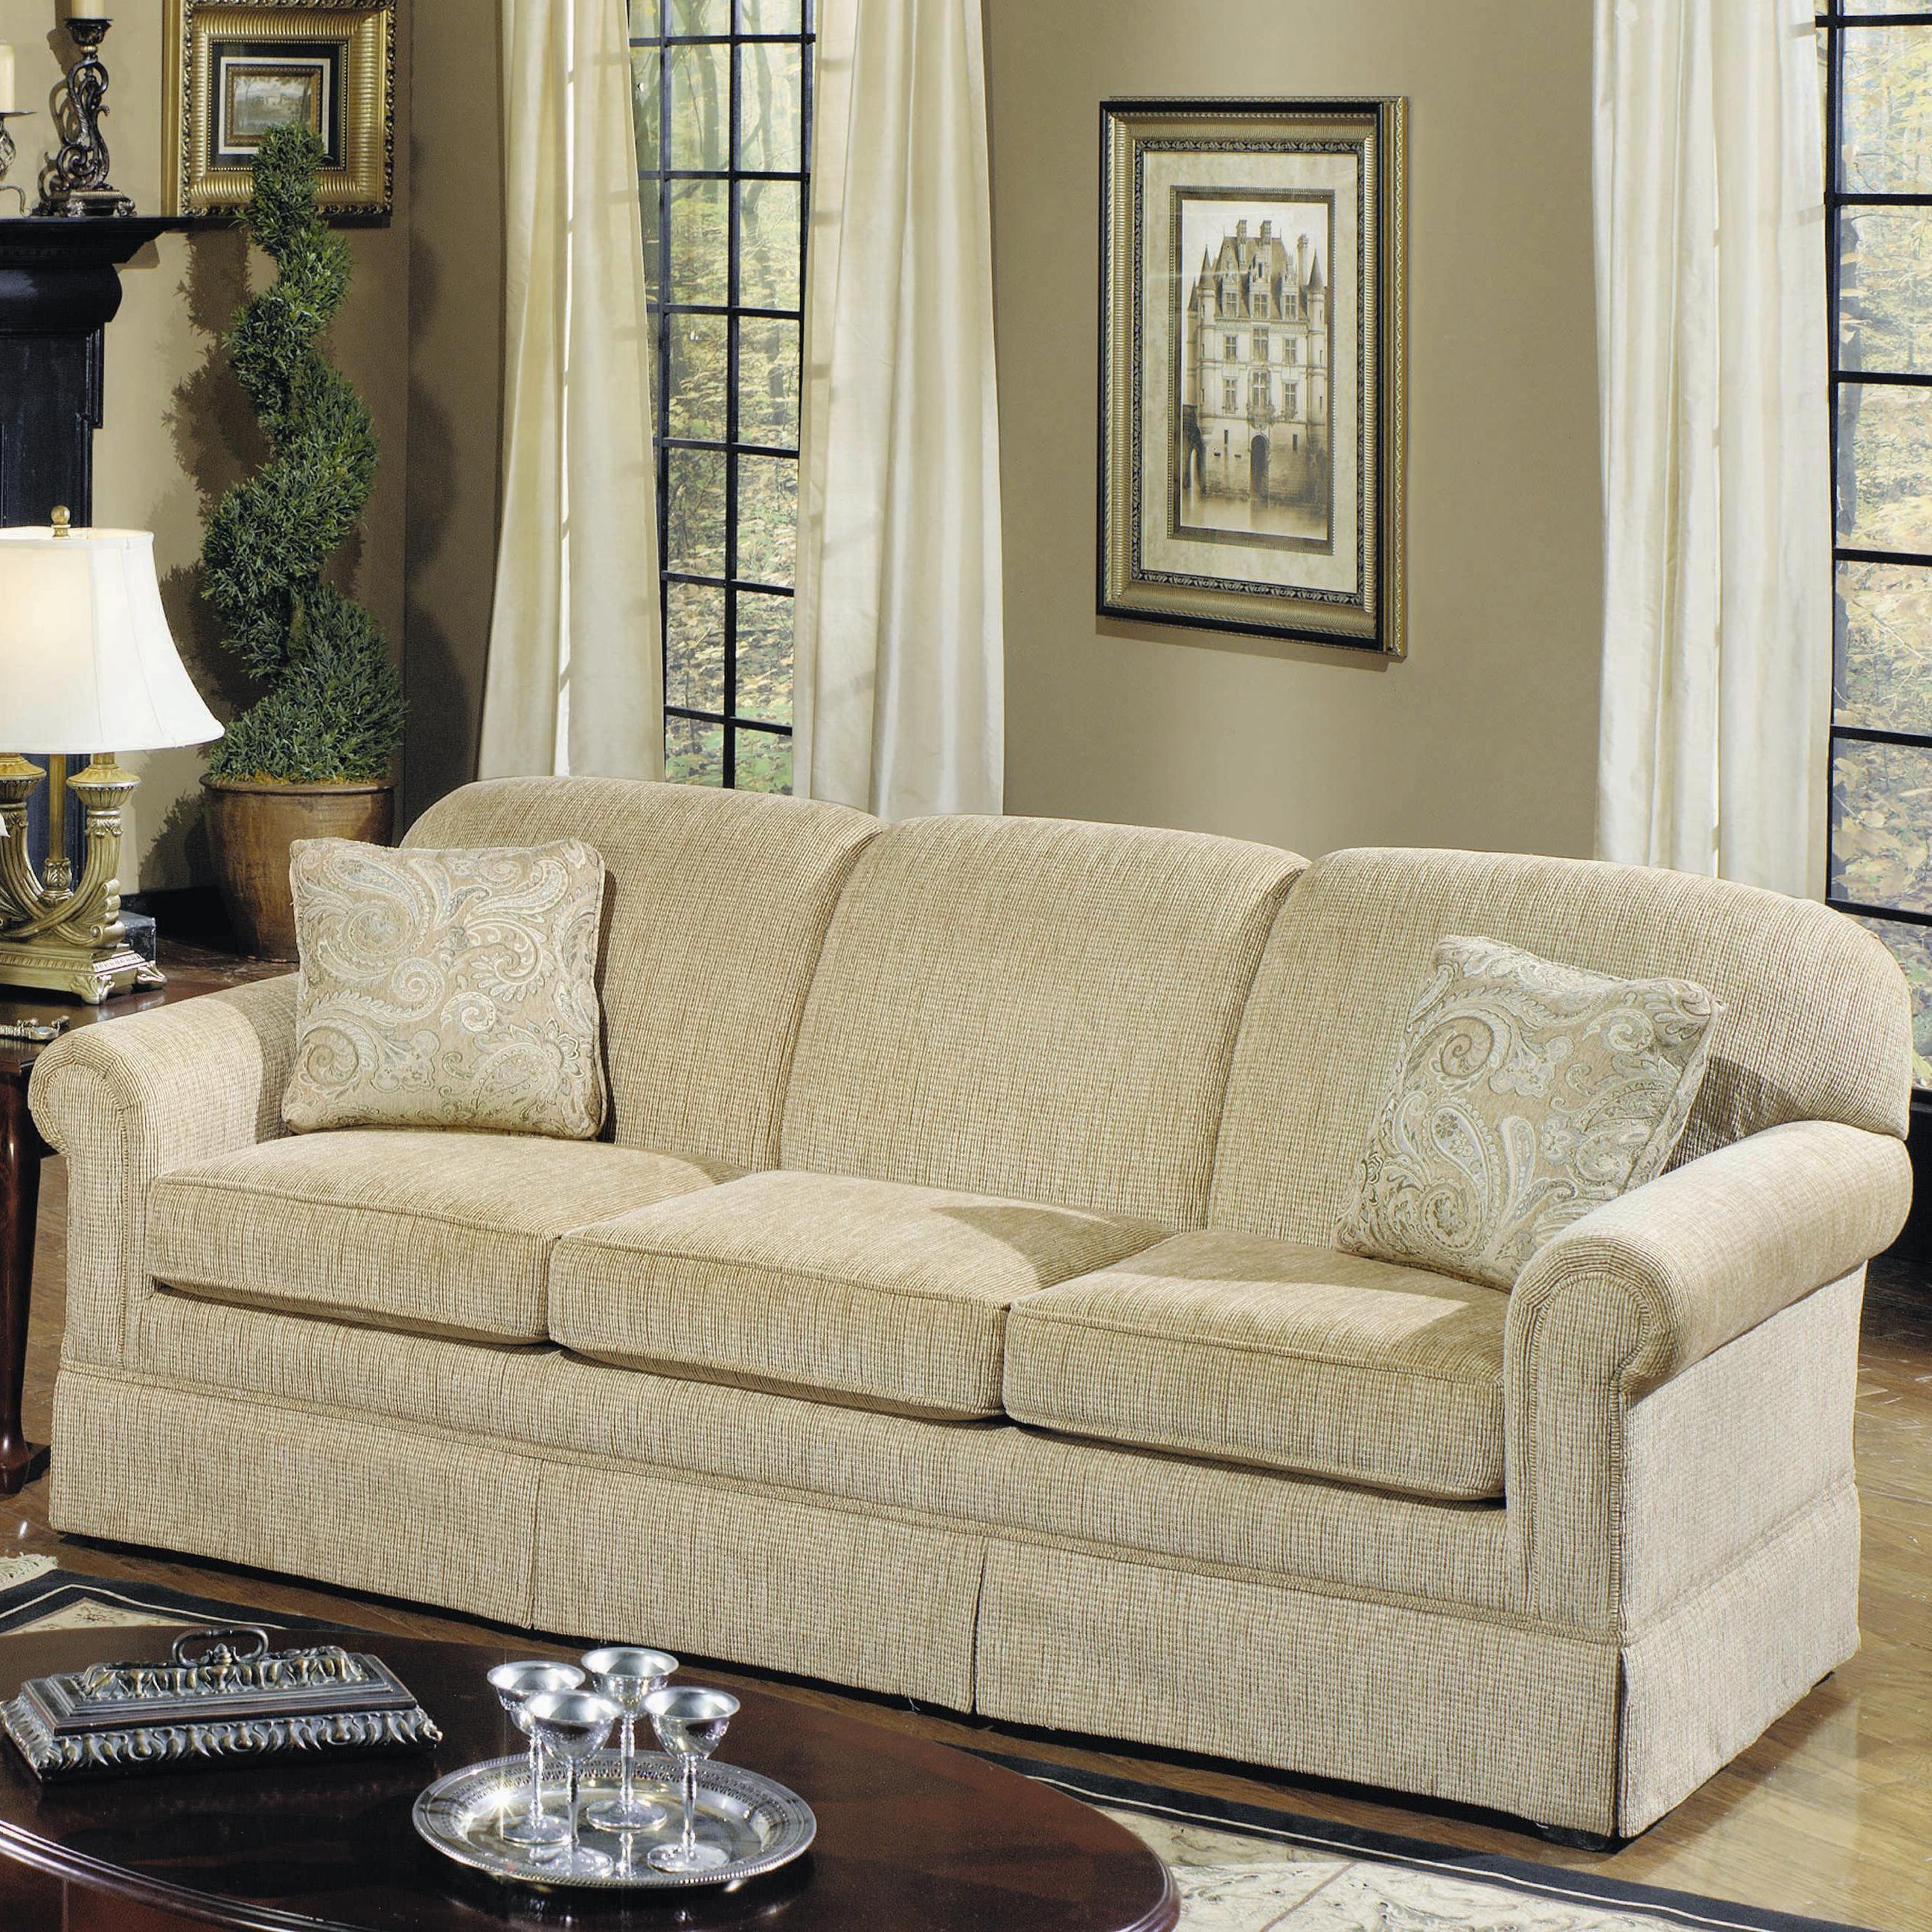 Craftmaster 4200Stationary Sofa; Craftmaster 4200Stationary Sofa